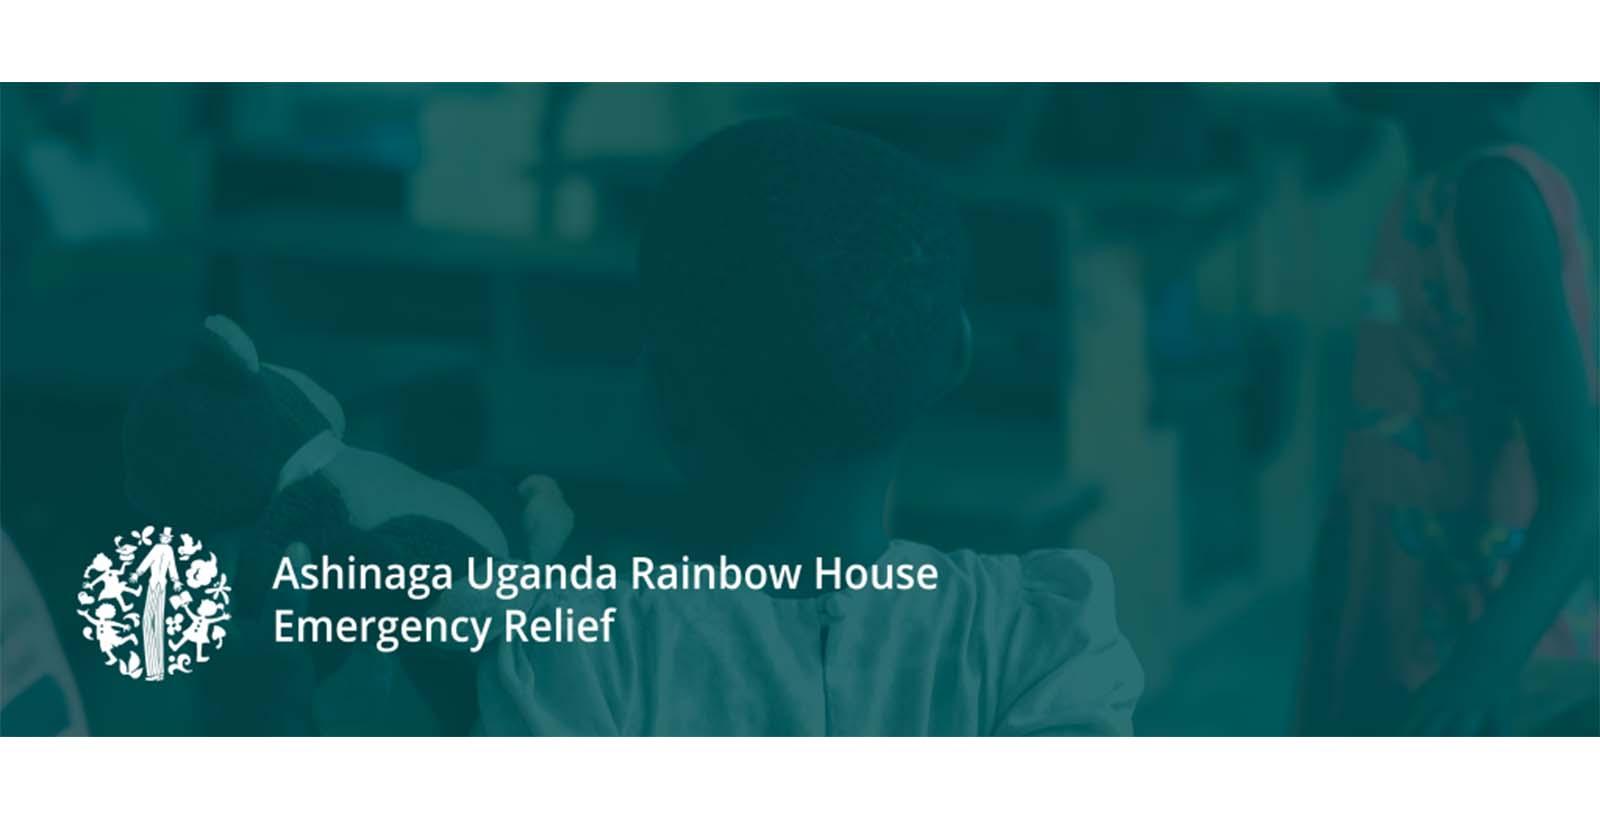 Emergency Relief for Ashinaga Uganda  Rainbow House Registered Households